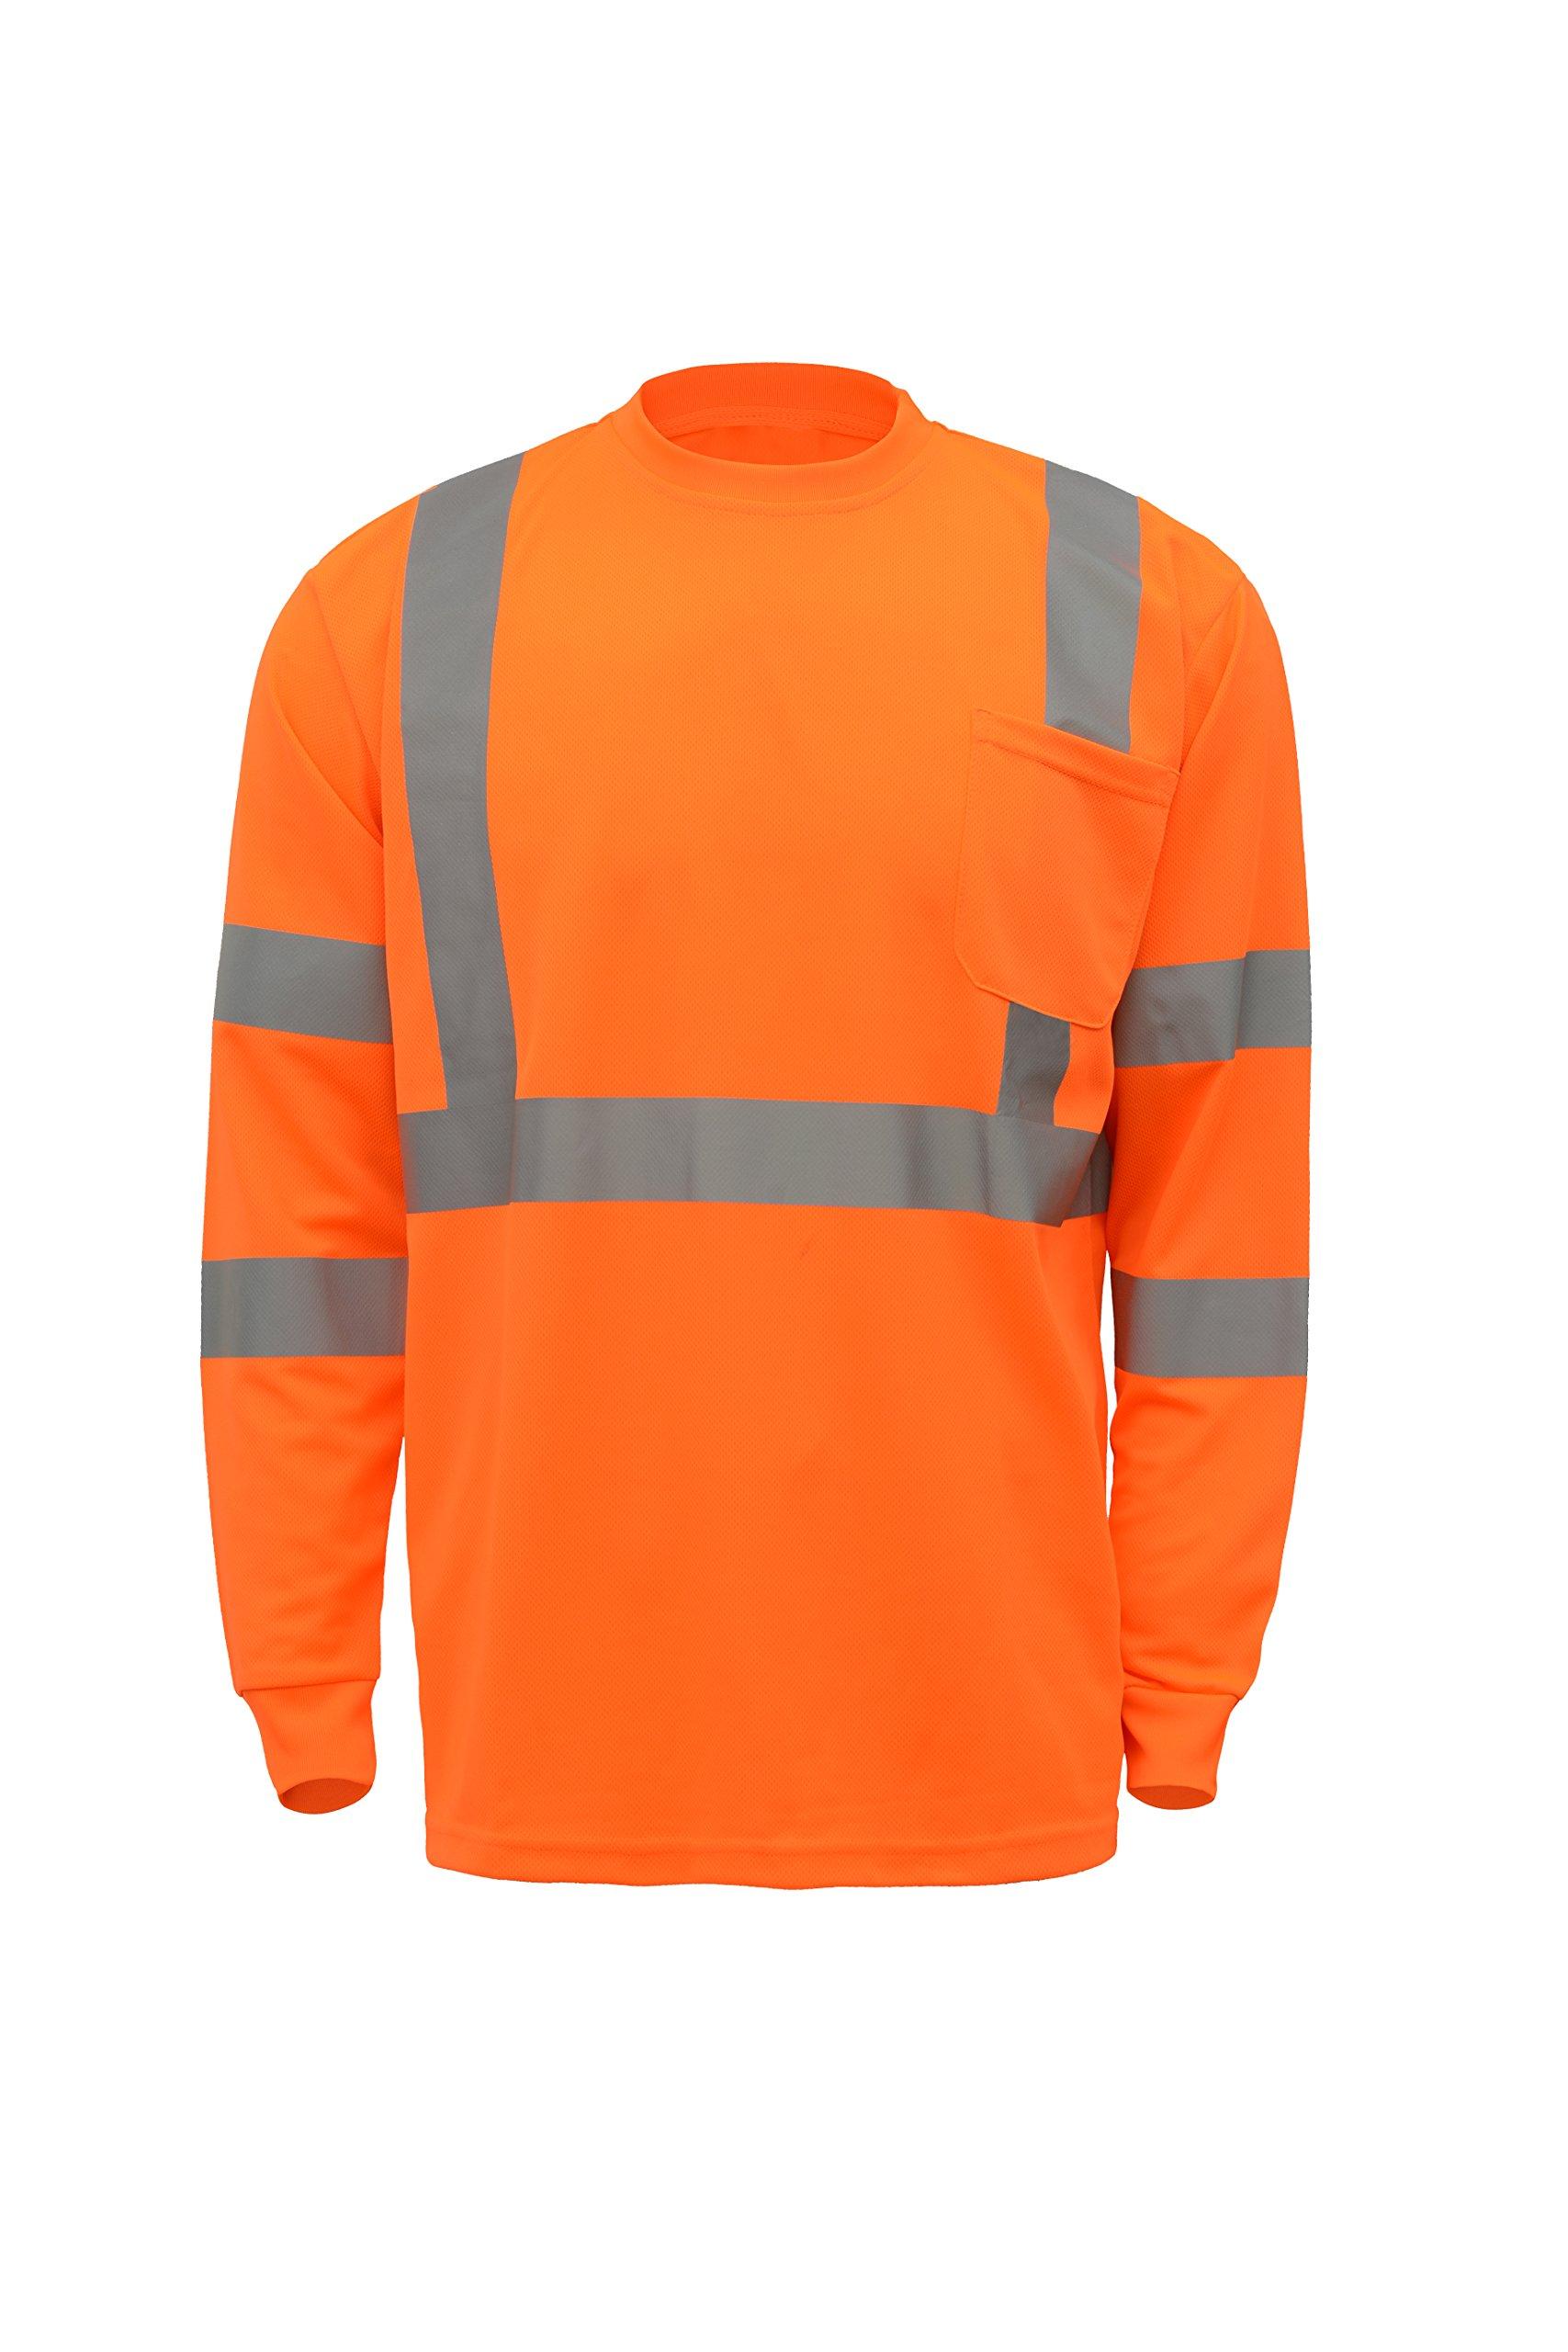 CJ Safety CJHVTS3002 ANSI Class 3 High Visibility Long Sleeve Safety Shirt | 2'' Reflective tapes | Moisture Wicking Mesh (Medium, Orange)